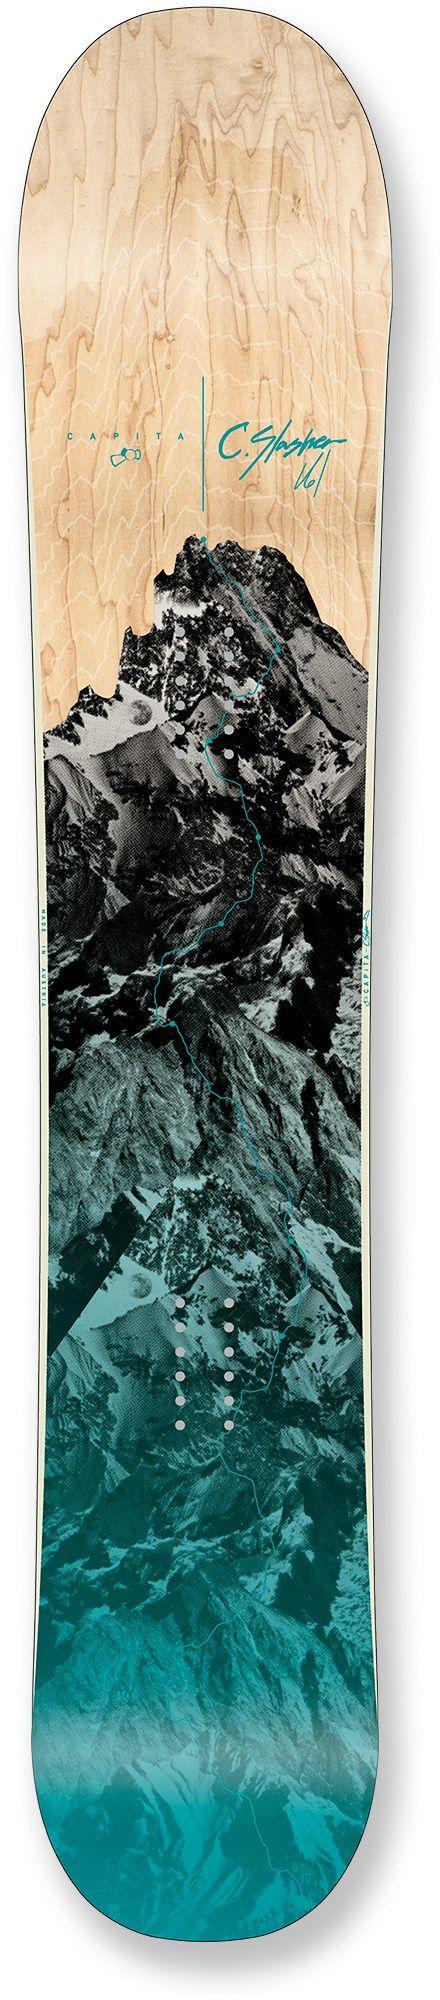 #LL @LUFELIVE #thepursuitofprogression #SnowboardingCapita Charlie Slasher Snowboard - 2014/2015